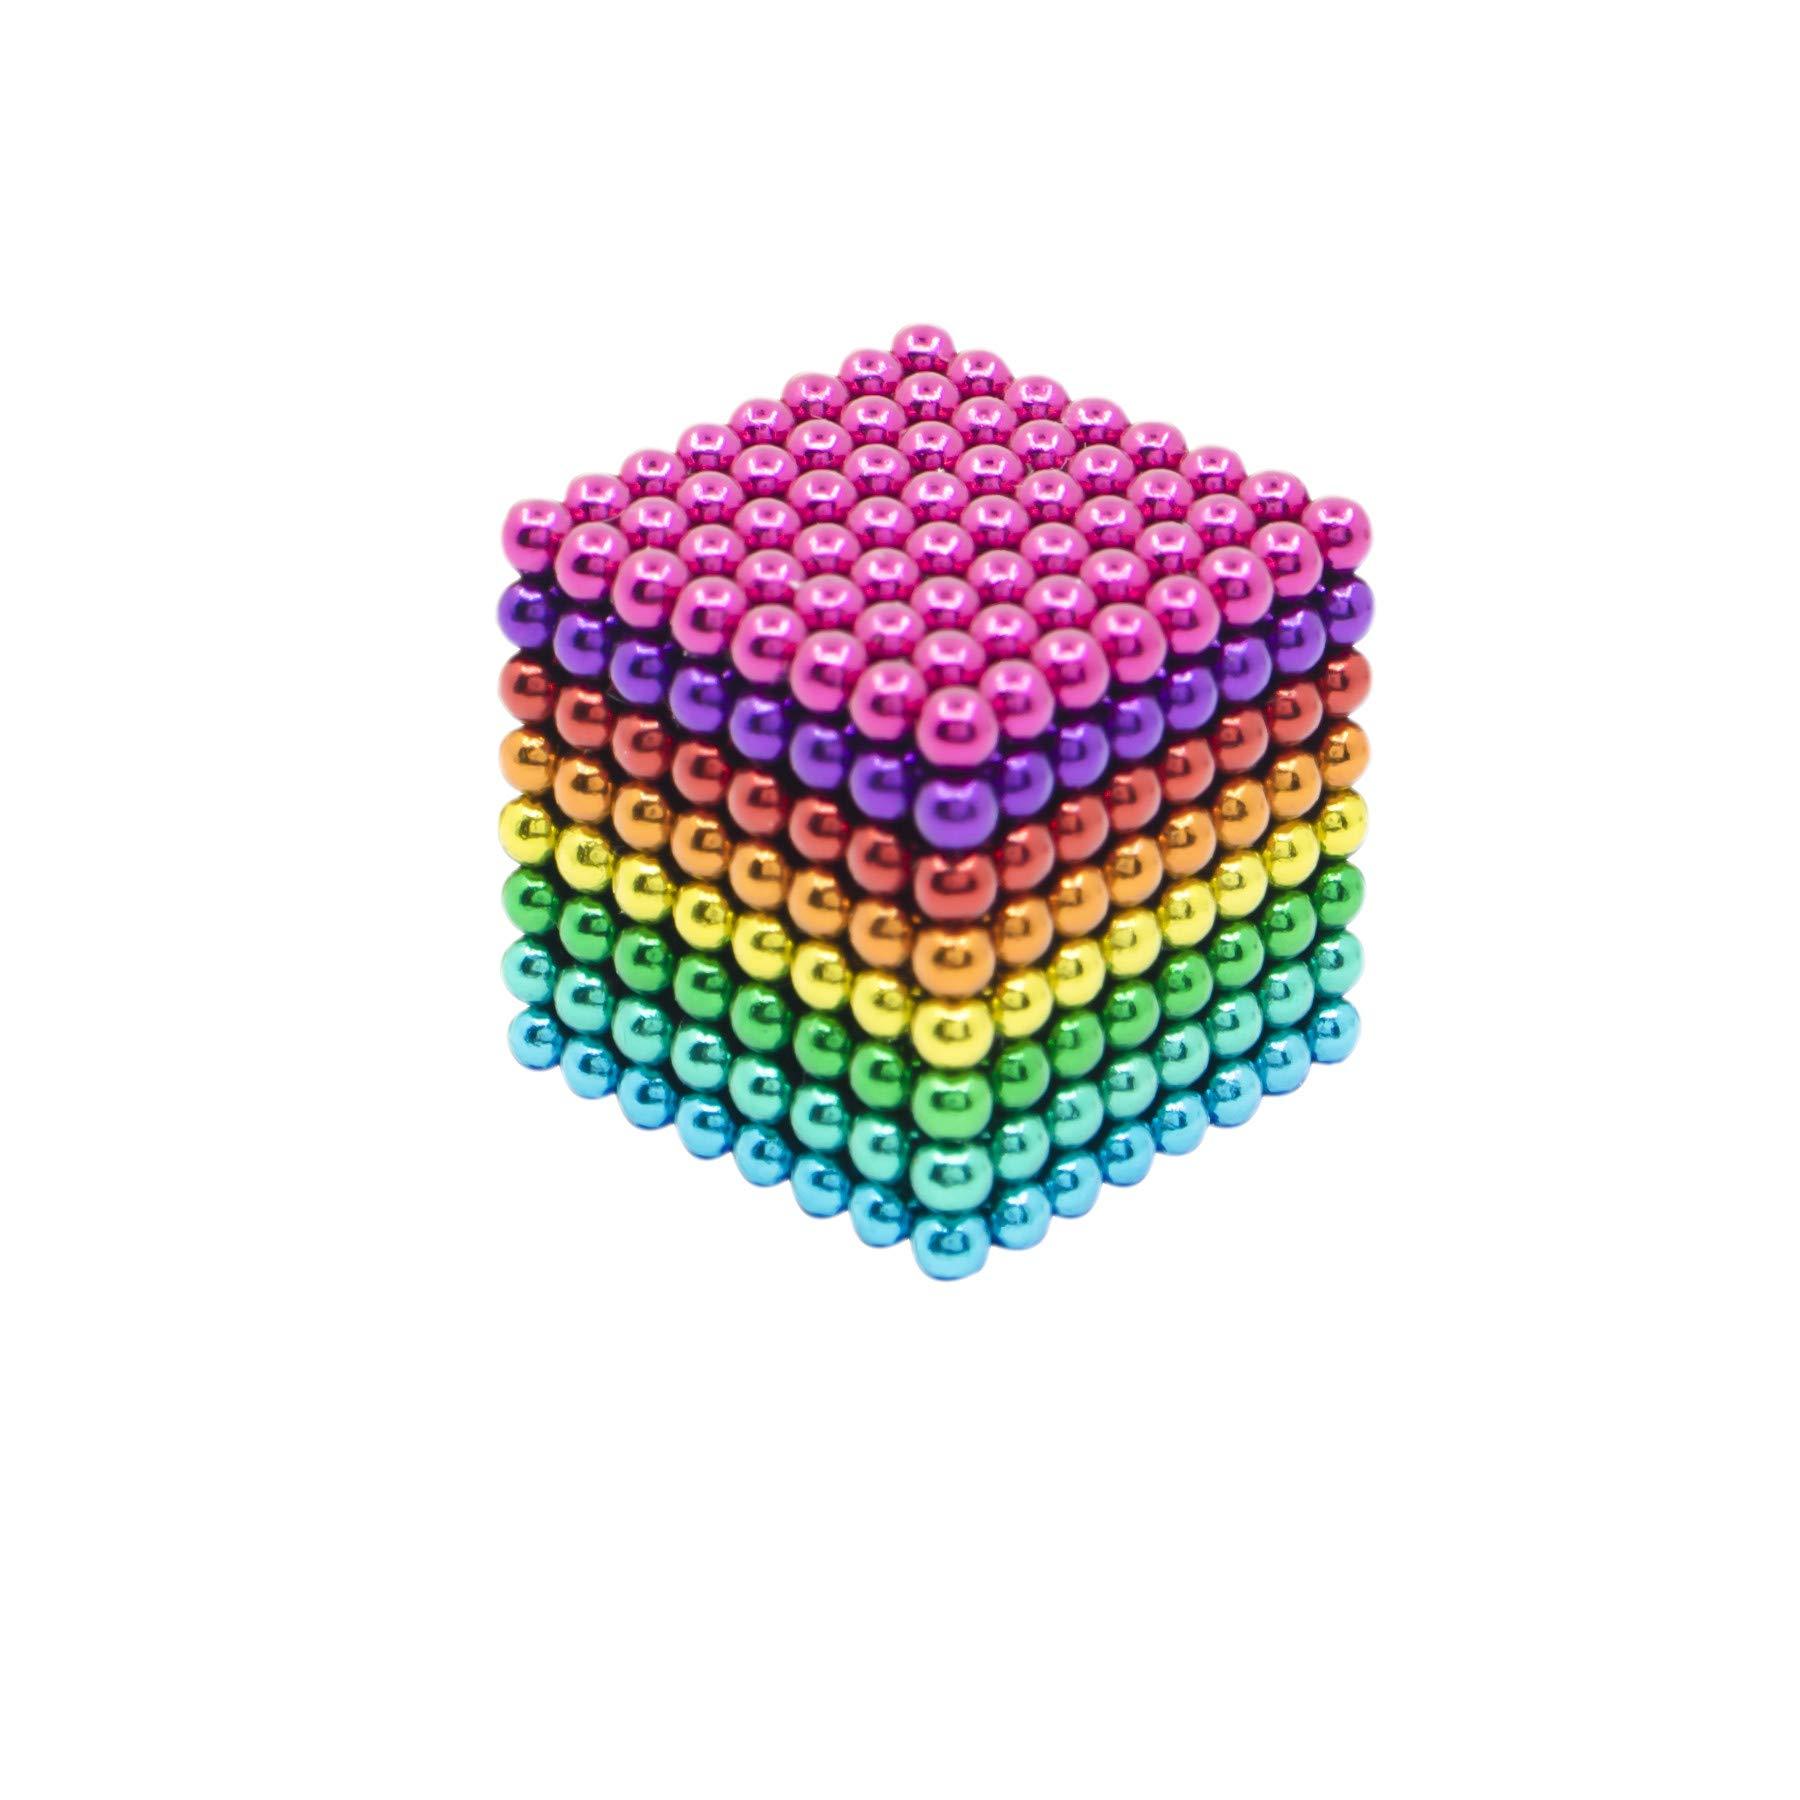 HBDeskToys Fidget Ball Puzzle,Cube Toys Sculpture Holders, Children's Puzzle Magic Cubes DIY Educational Toys for Intelligence & Stress Relief, 512Pcs,Colorful